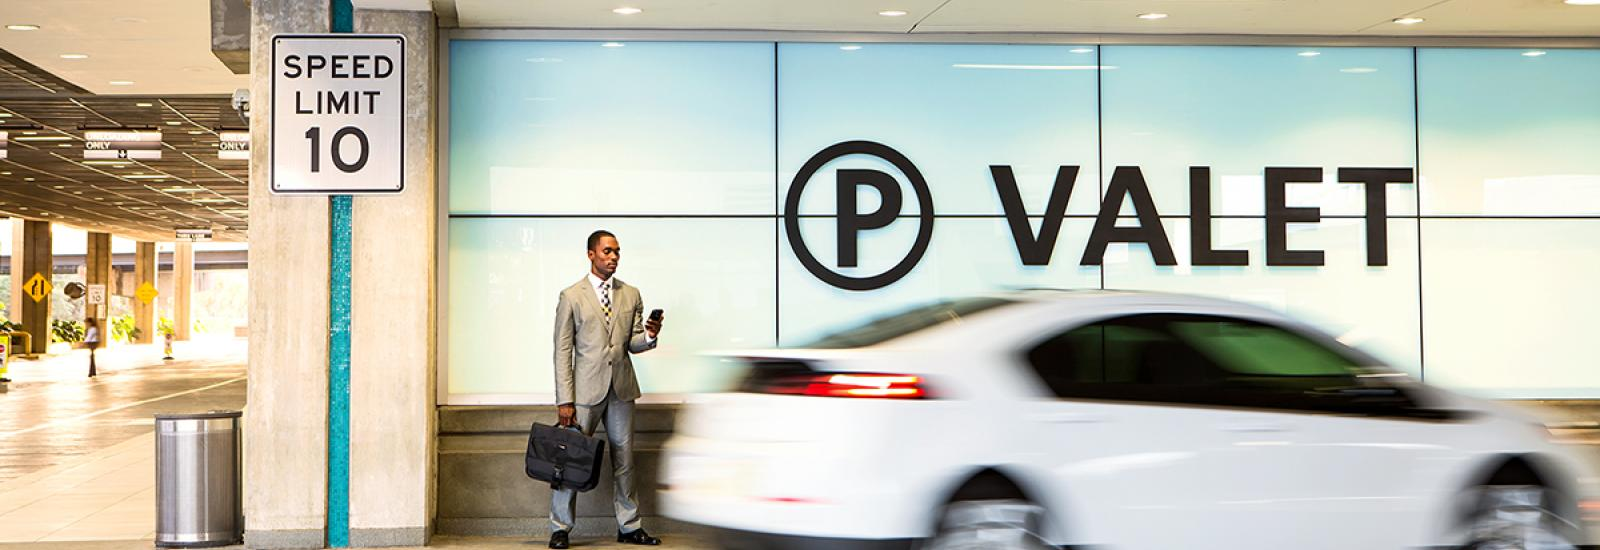 UK Airport Valet Parking Deals